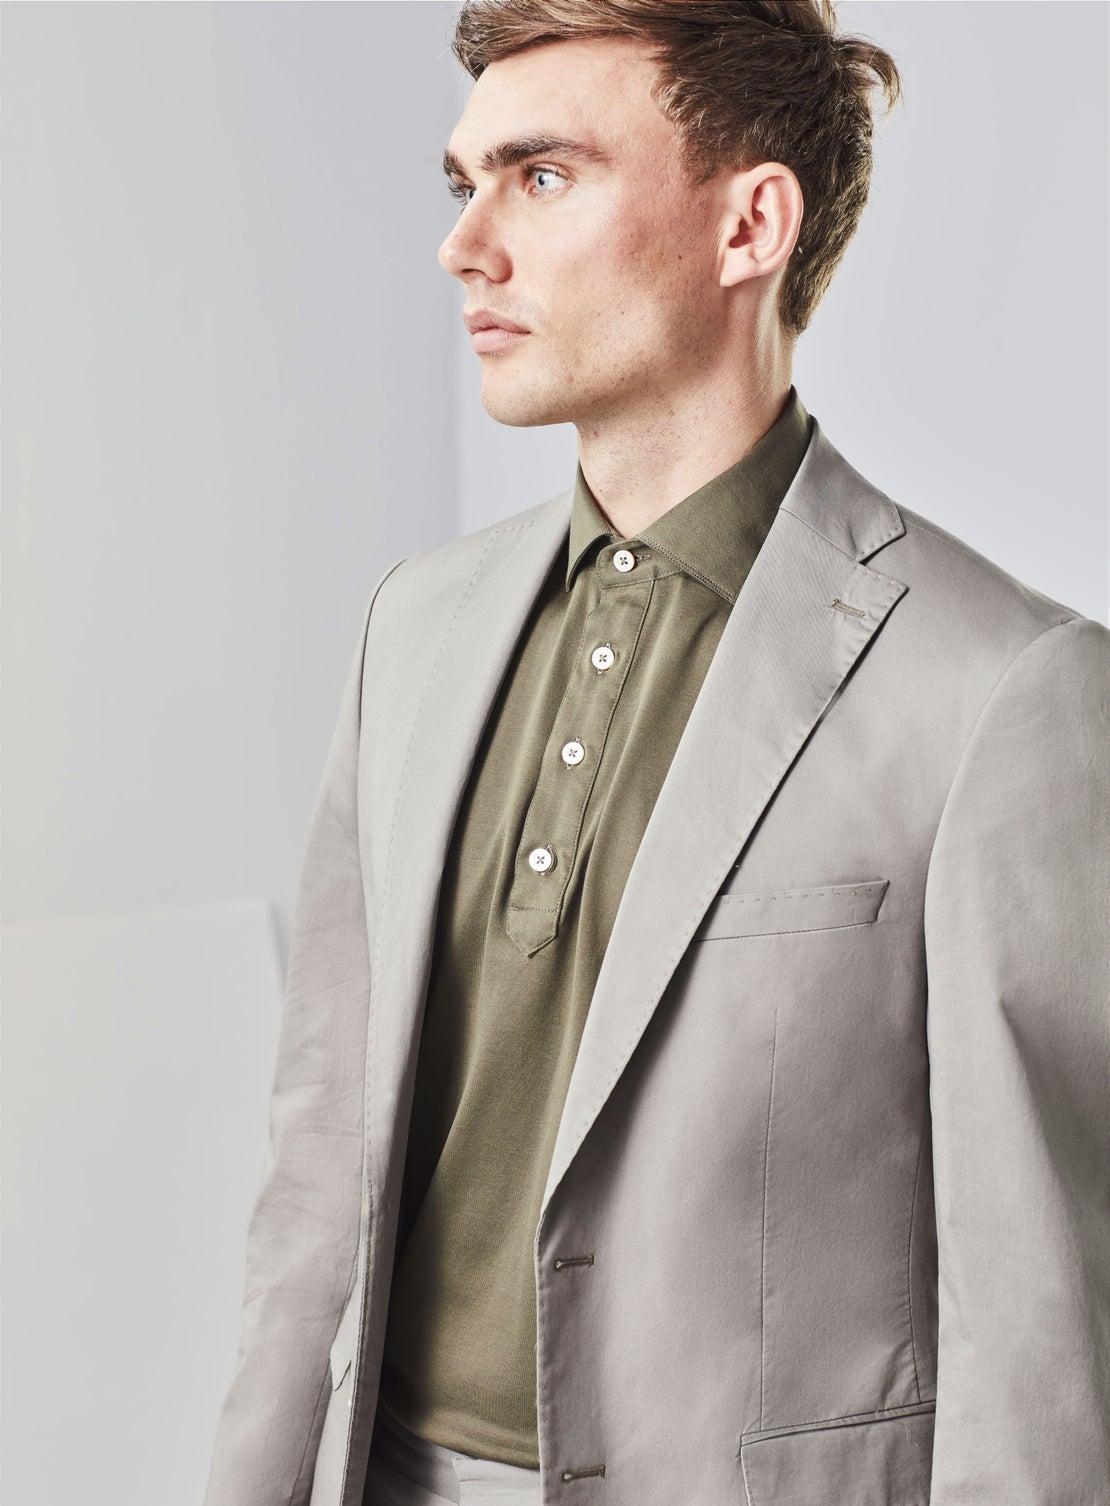 Olive Green Mercerized Cotton Short Sleeved Shirt